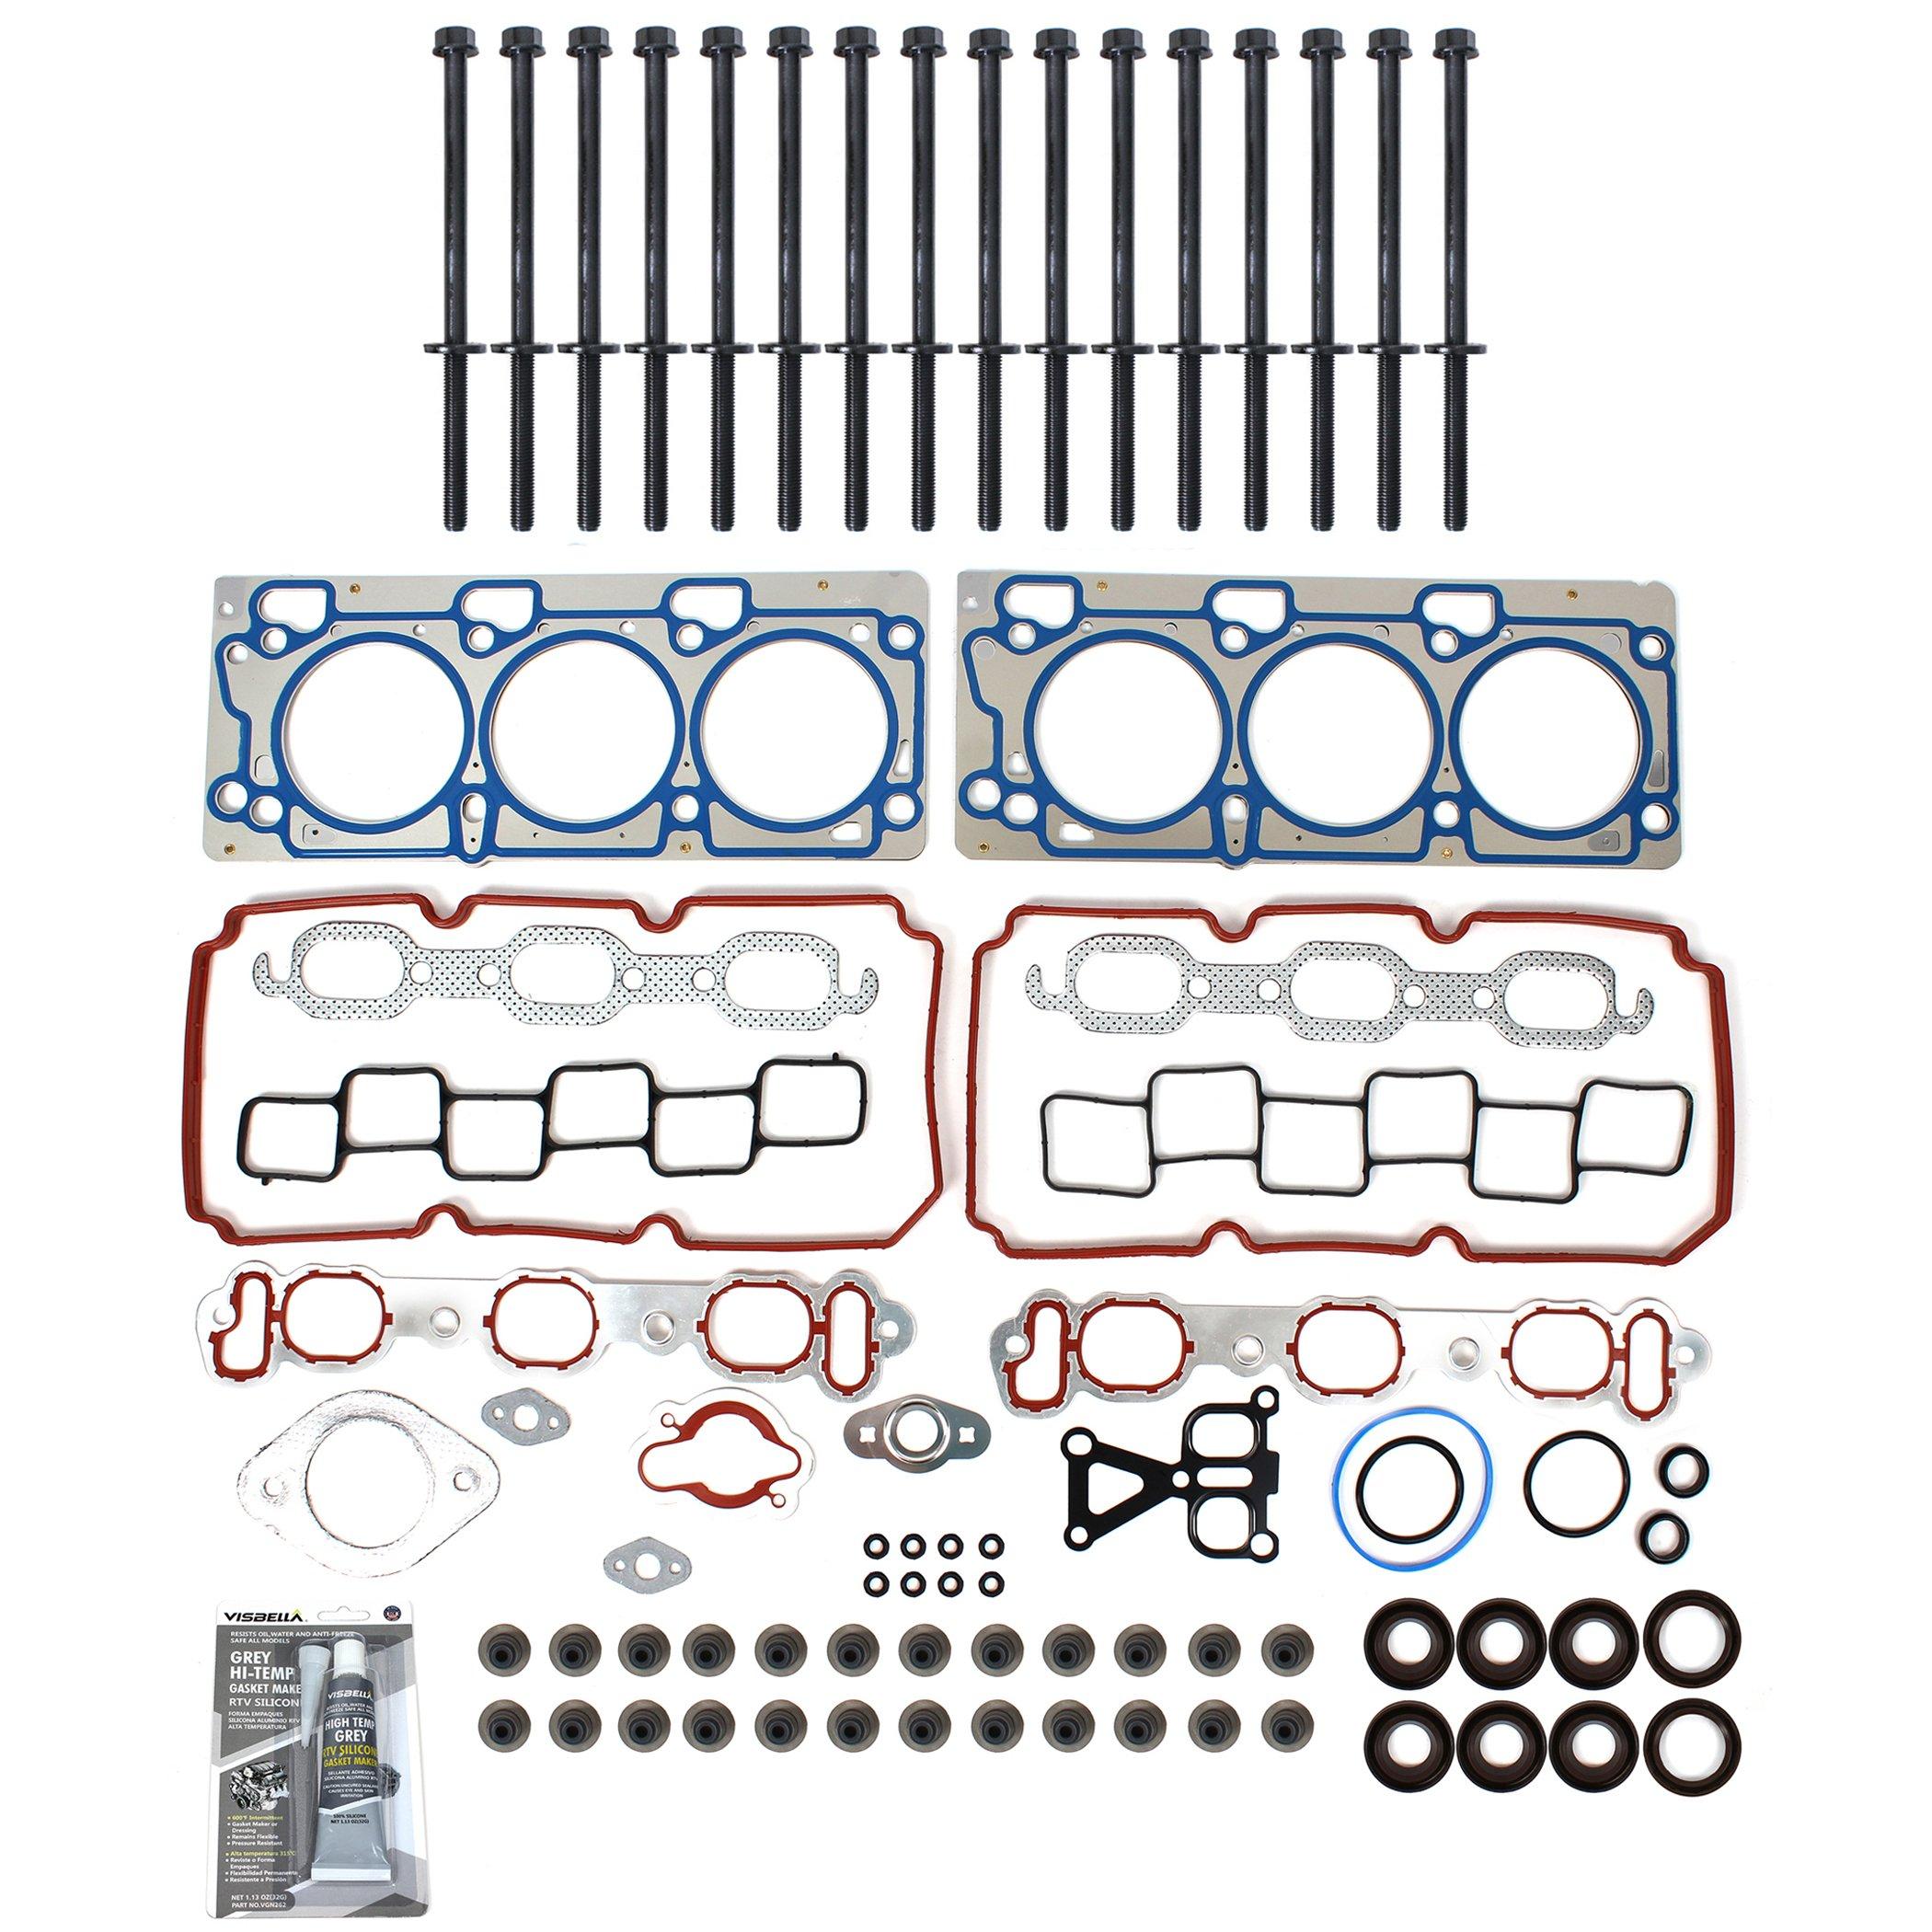 TS2620802HB Brand New MLS Cylinder Head Gasket Set and Head Bolt Kit